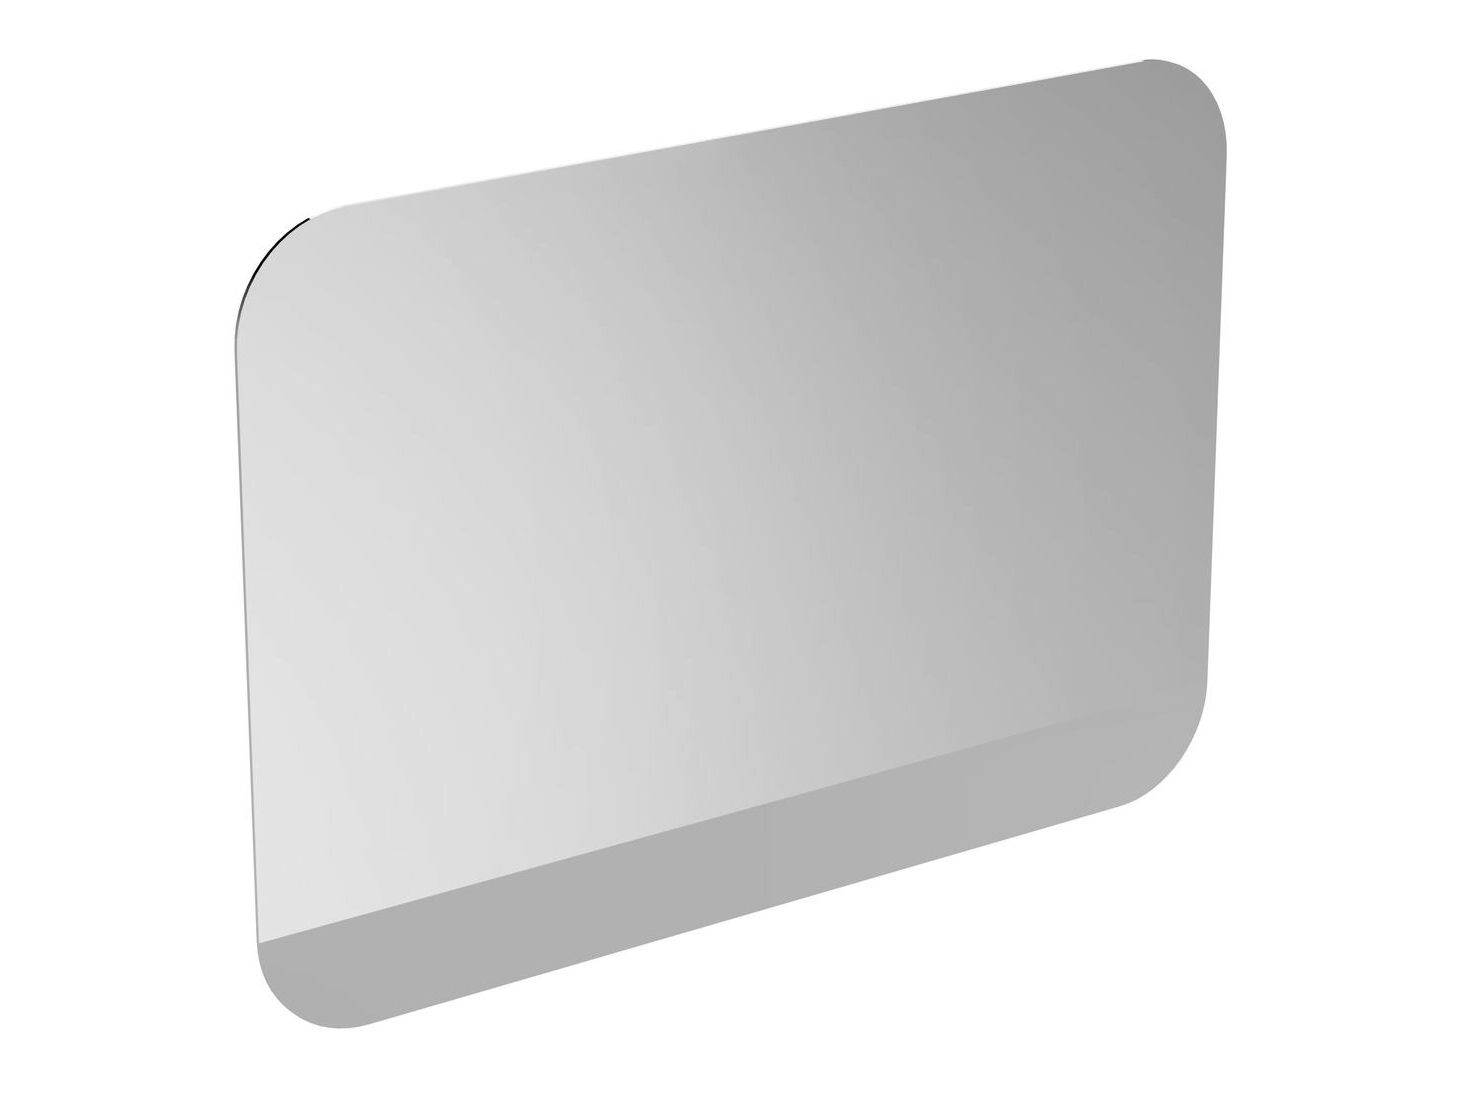 Salle De Bain Kramer ~ miroir mural avec clairage int gr pour salle de bain tonic ii 100